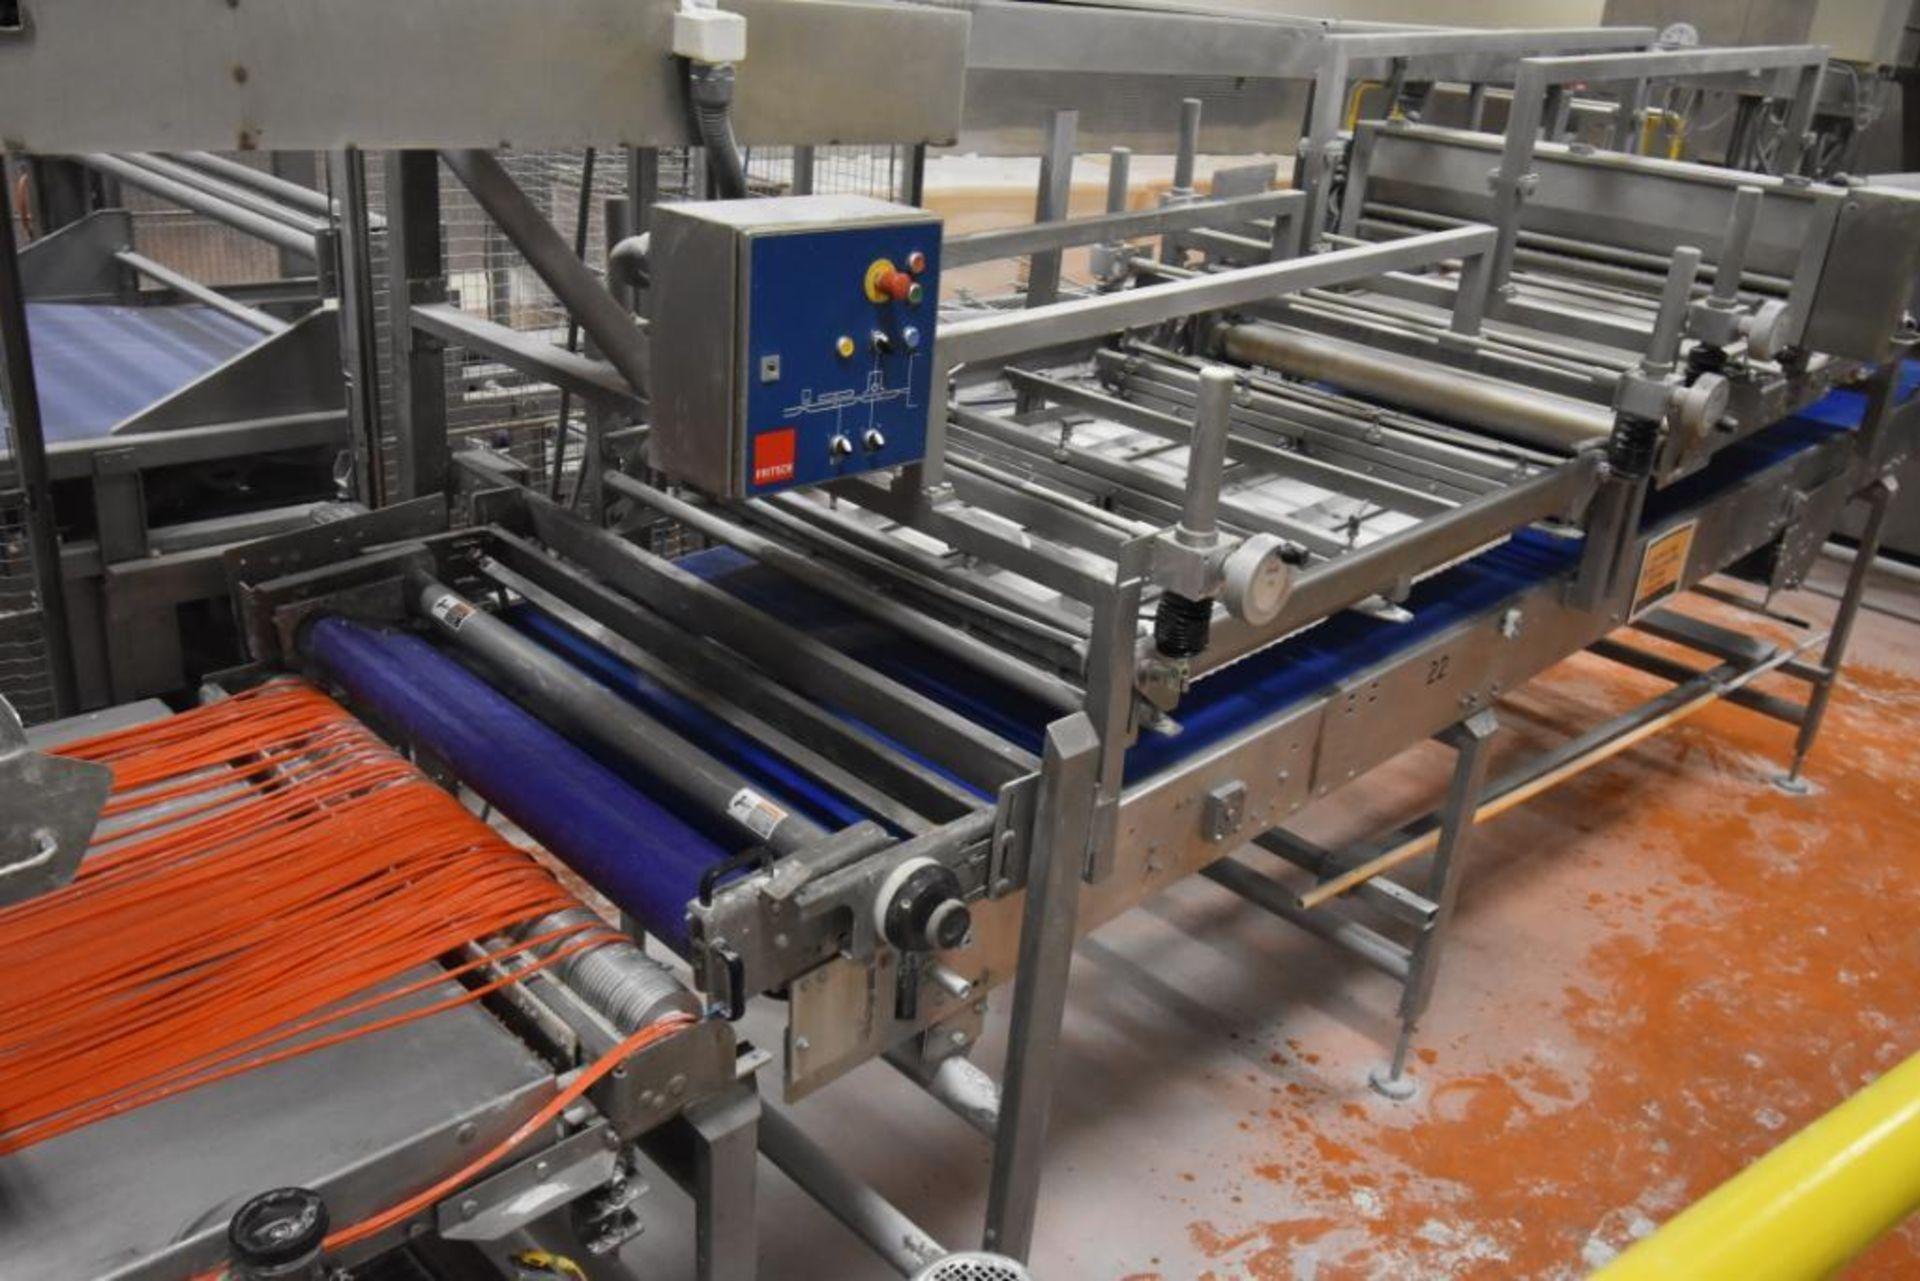 2007 Fritsch Laminator 3000 dough line - Image 183 of 280